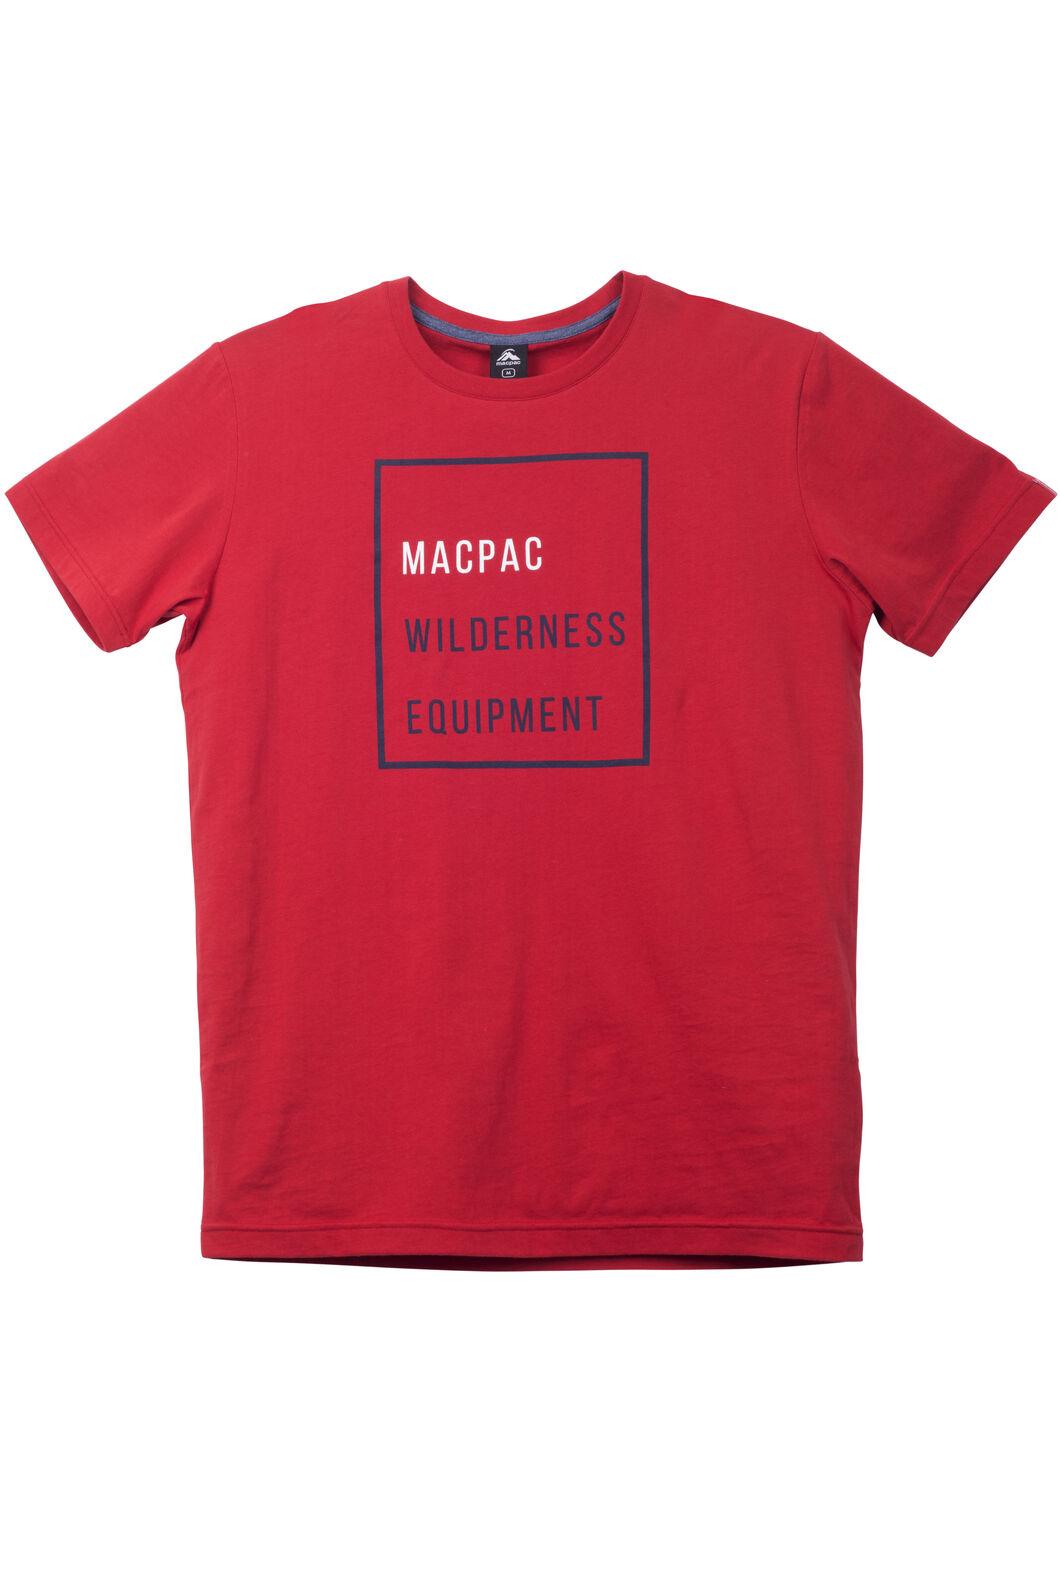 Macpac MWE Organic Cotton Tee - Men's, Pompeian, hi-res